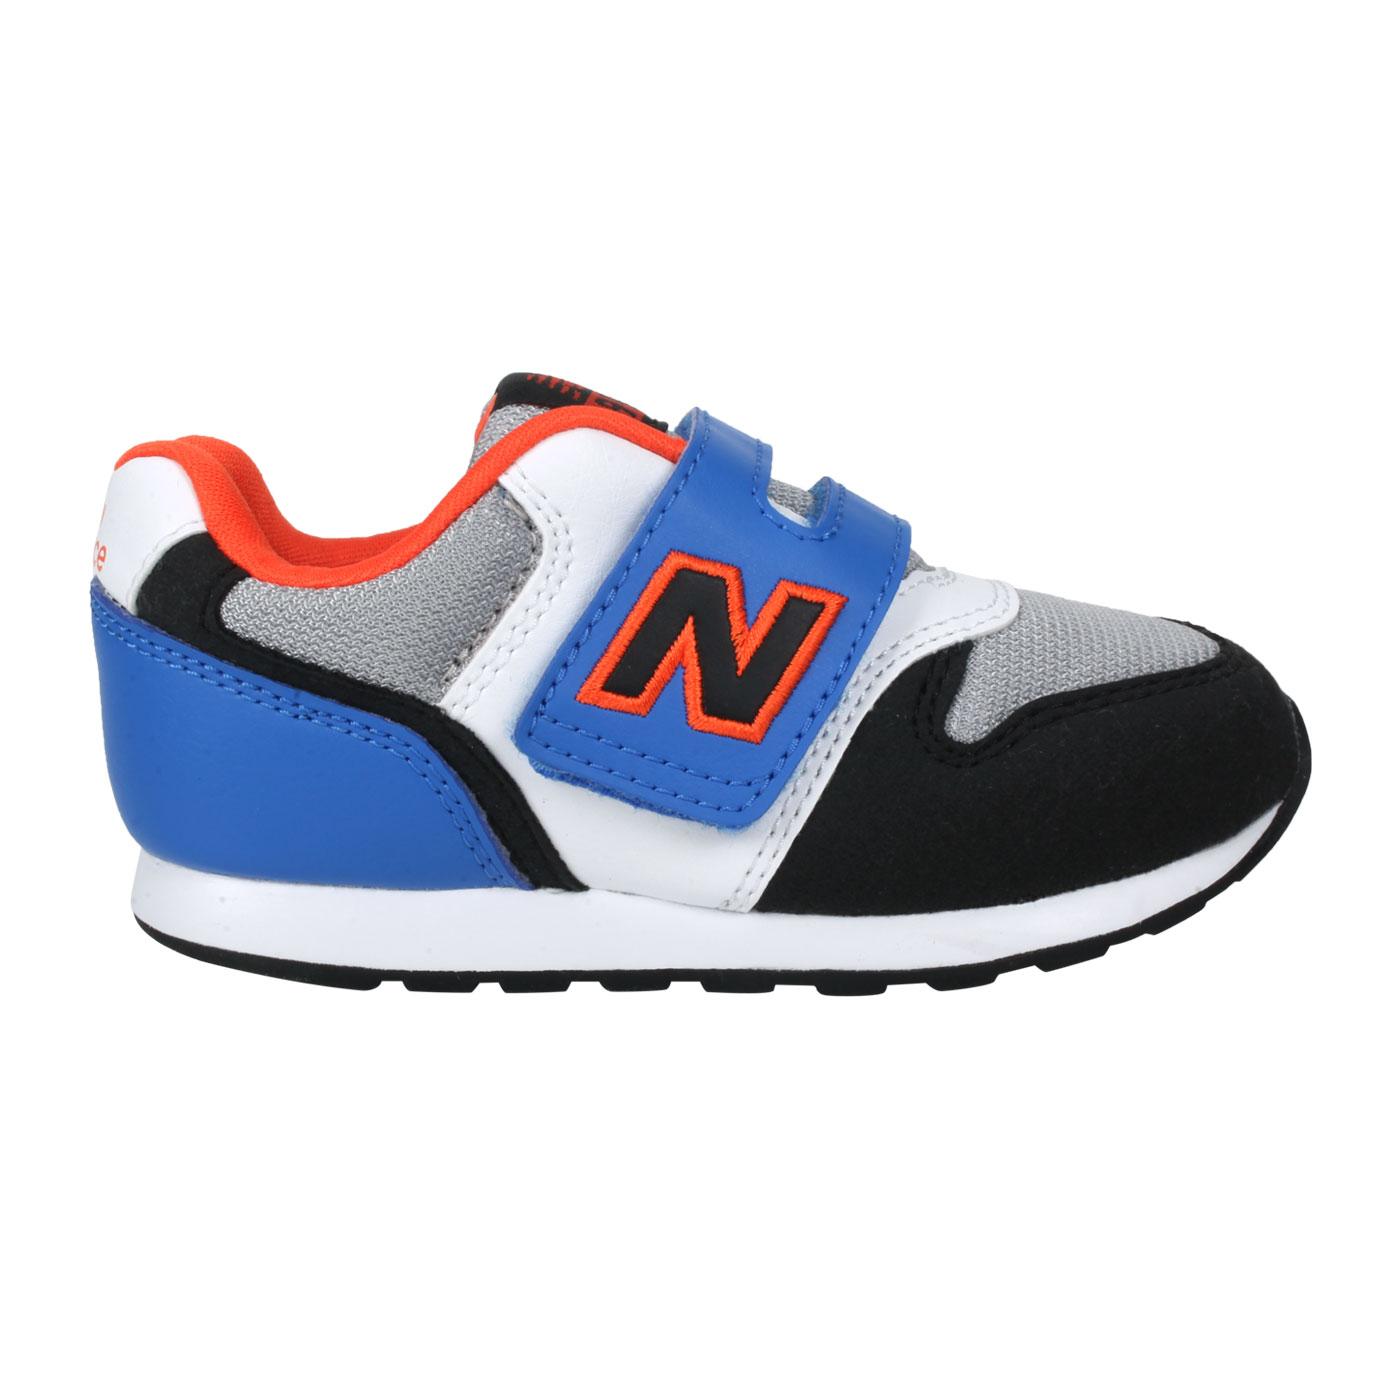 NEW BALANCE 小童休閒運動鞋-WIDE IZ996MBO - 黑白藍橘